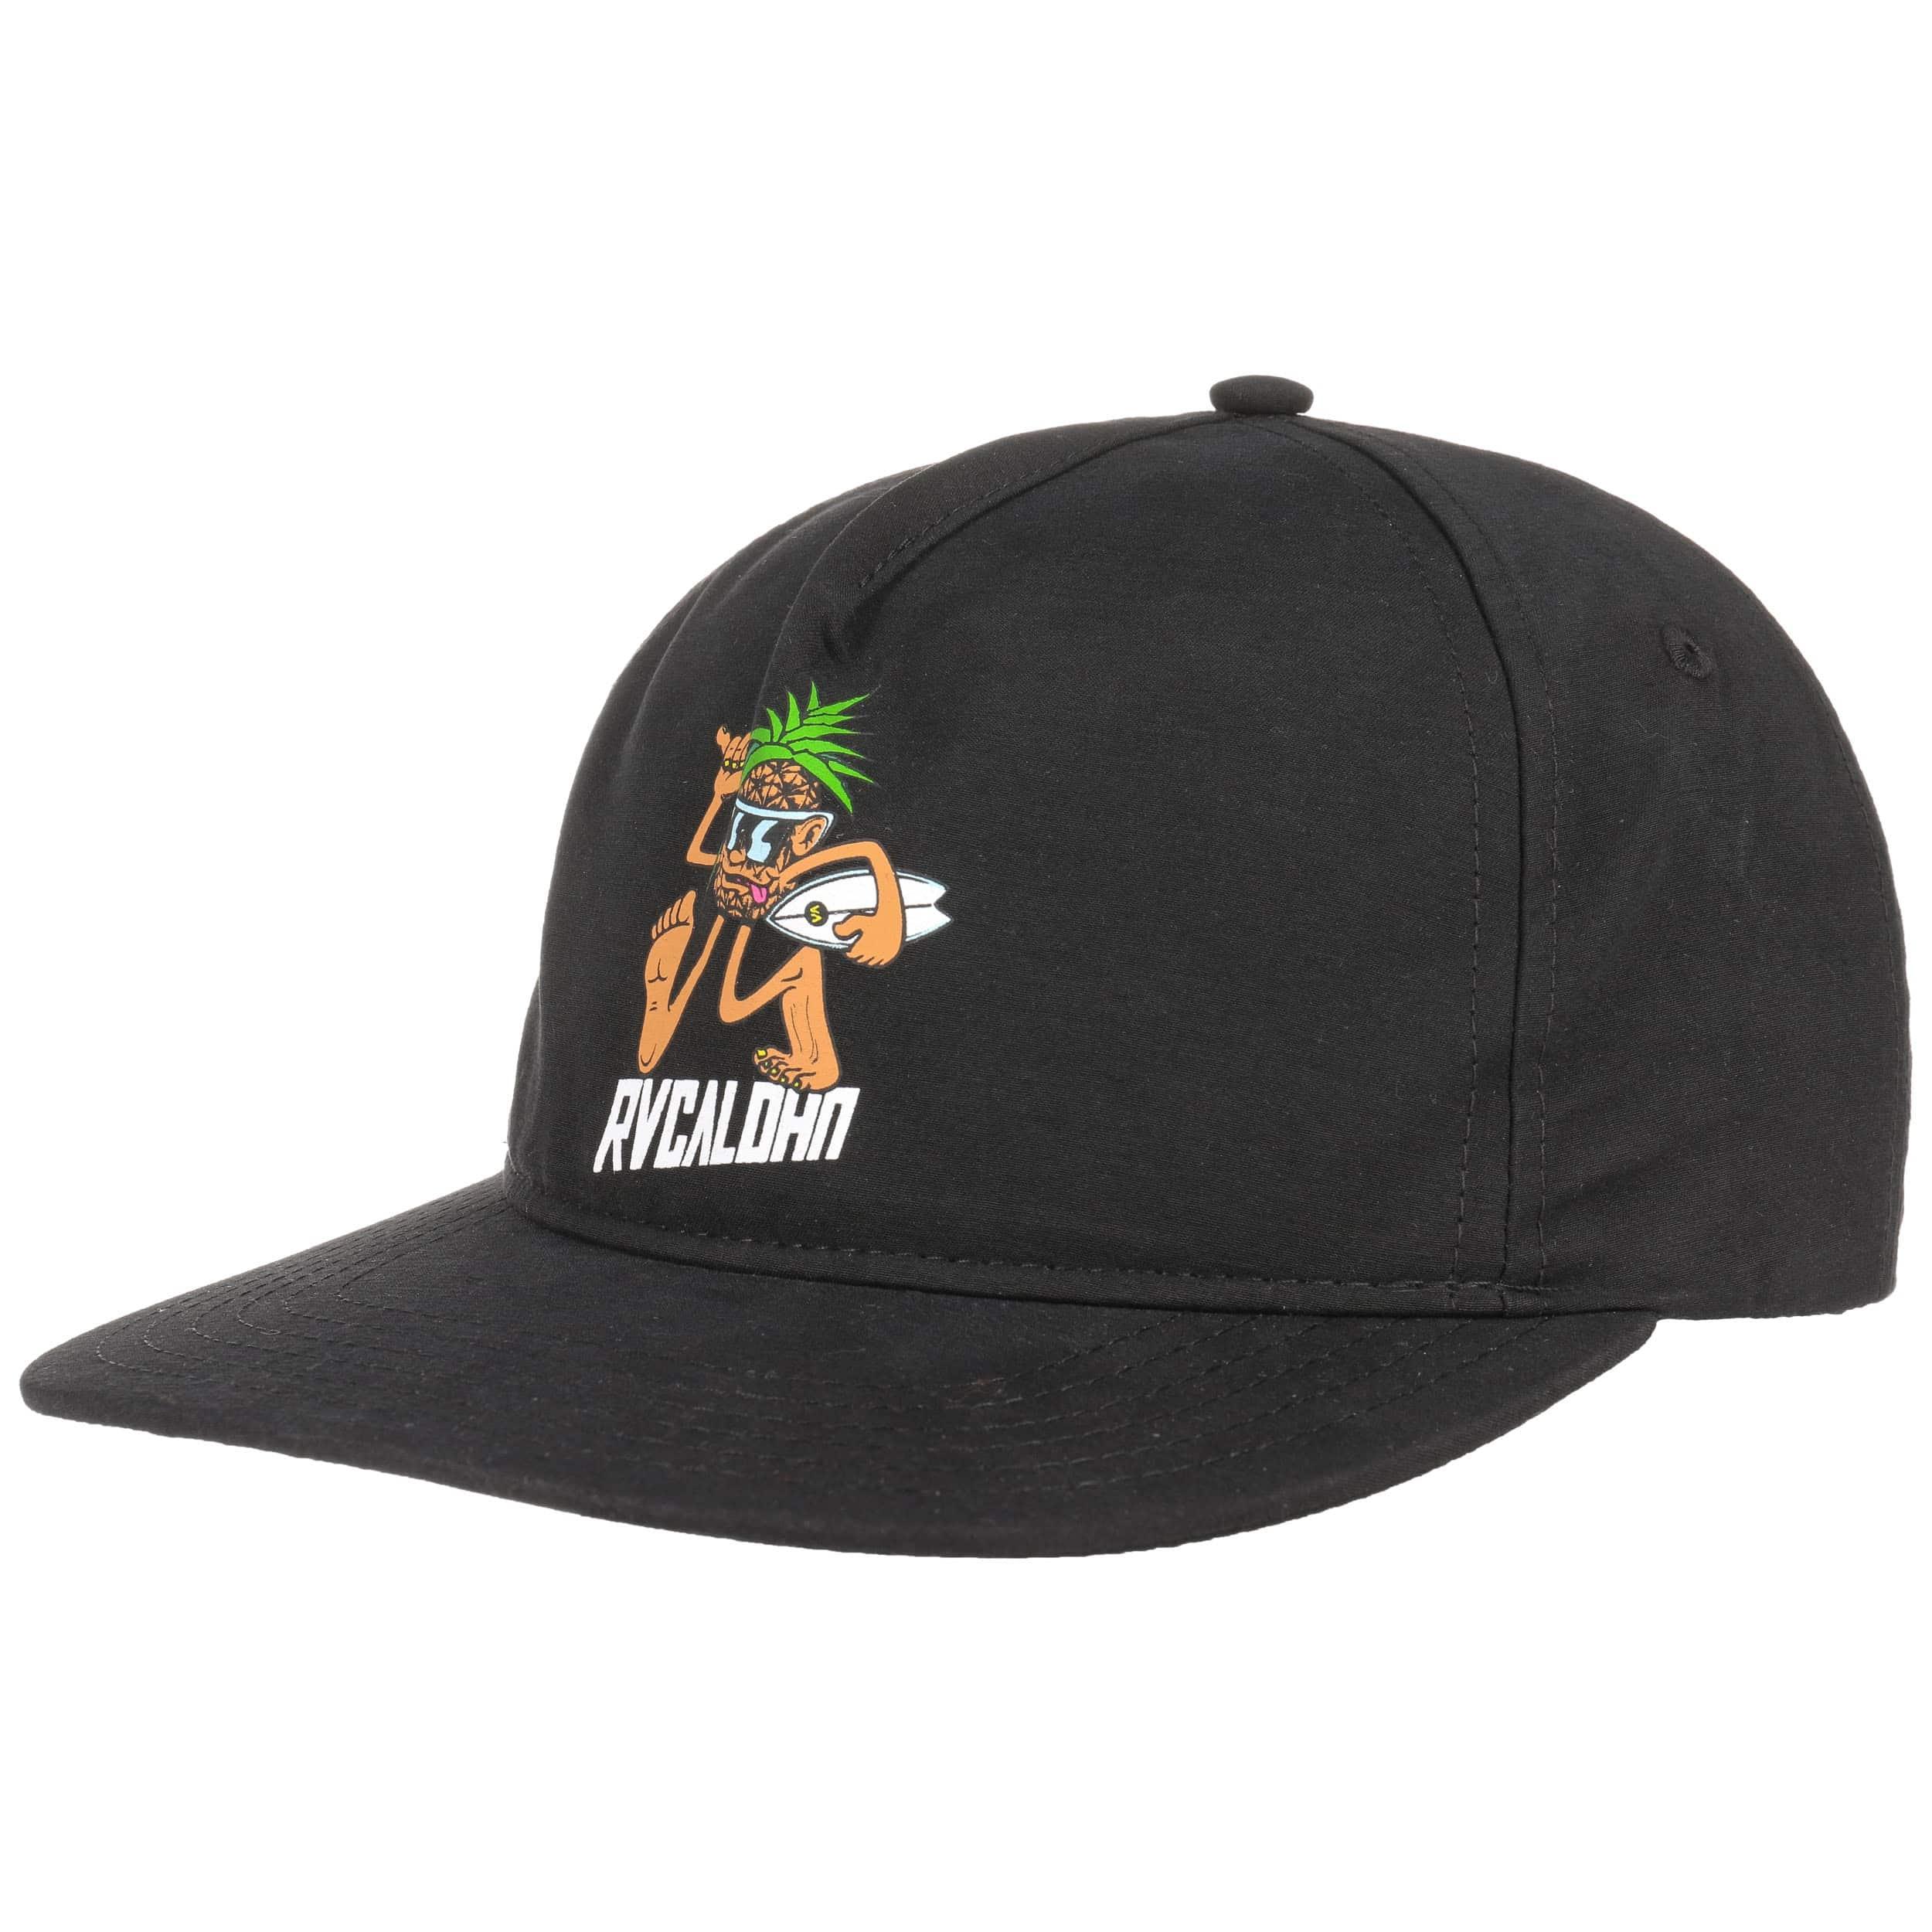 brand new 0df53 4039b ... shopping pineapple man snapback cap by rvca black 5 eb2b7 47464 ...